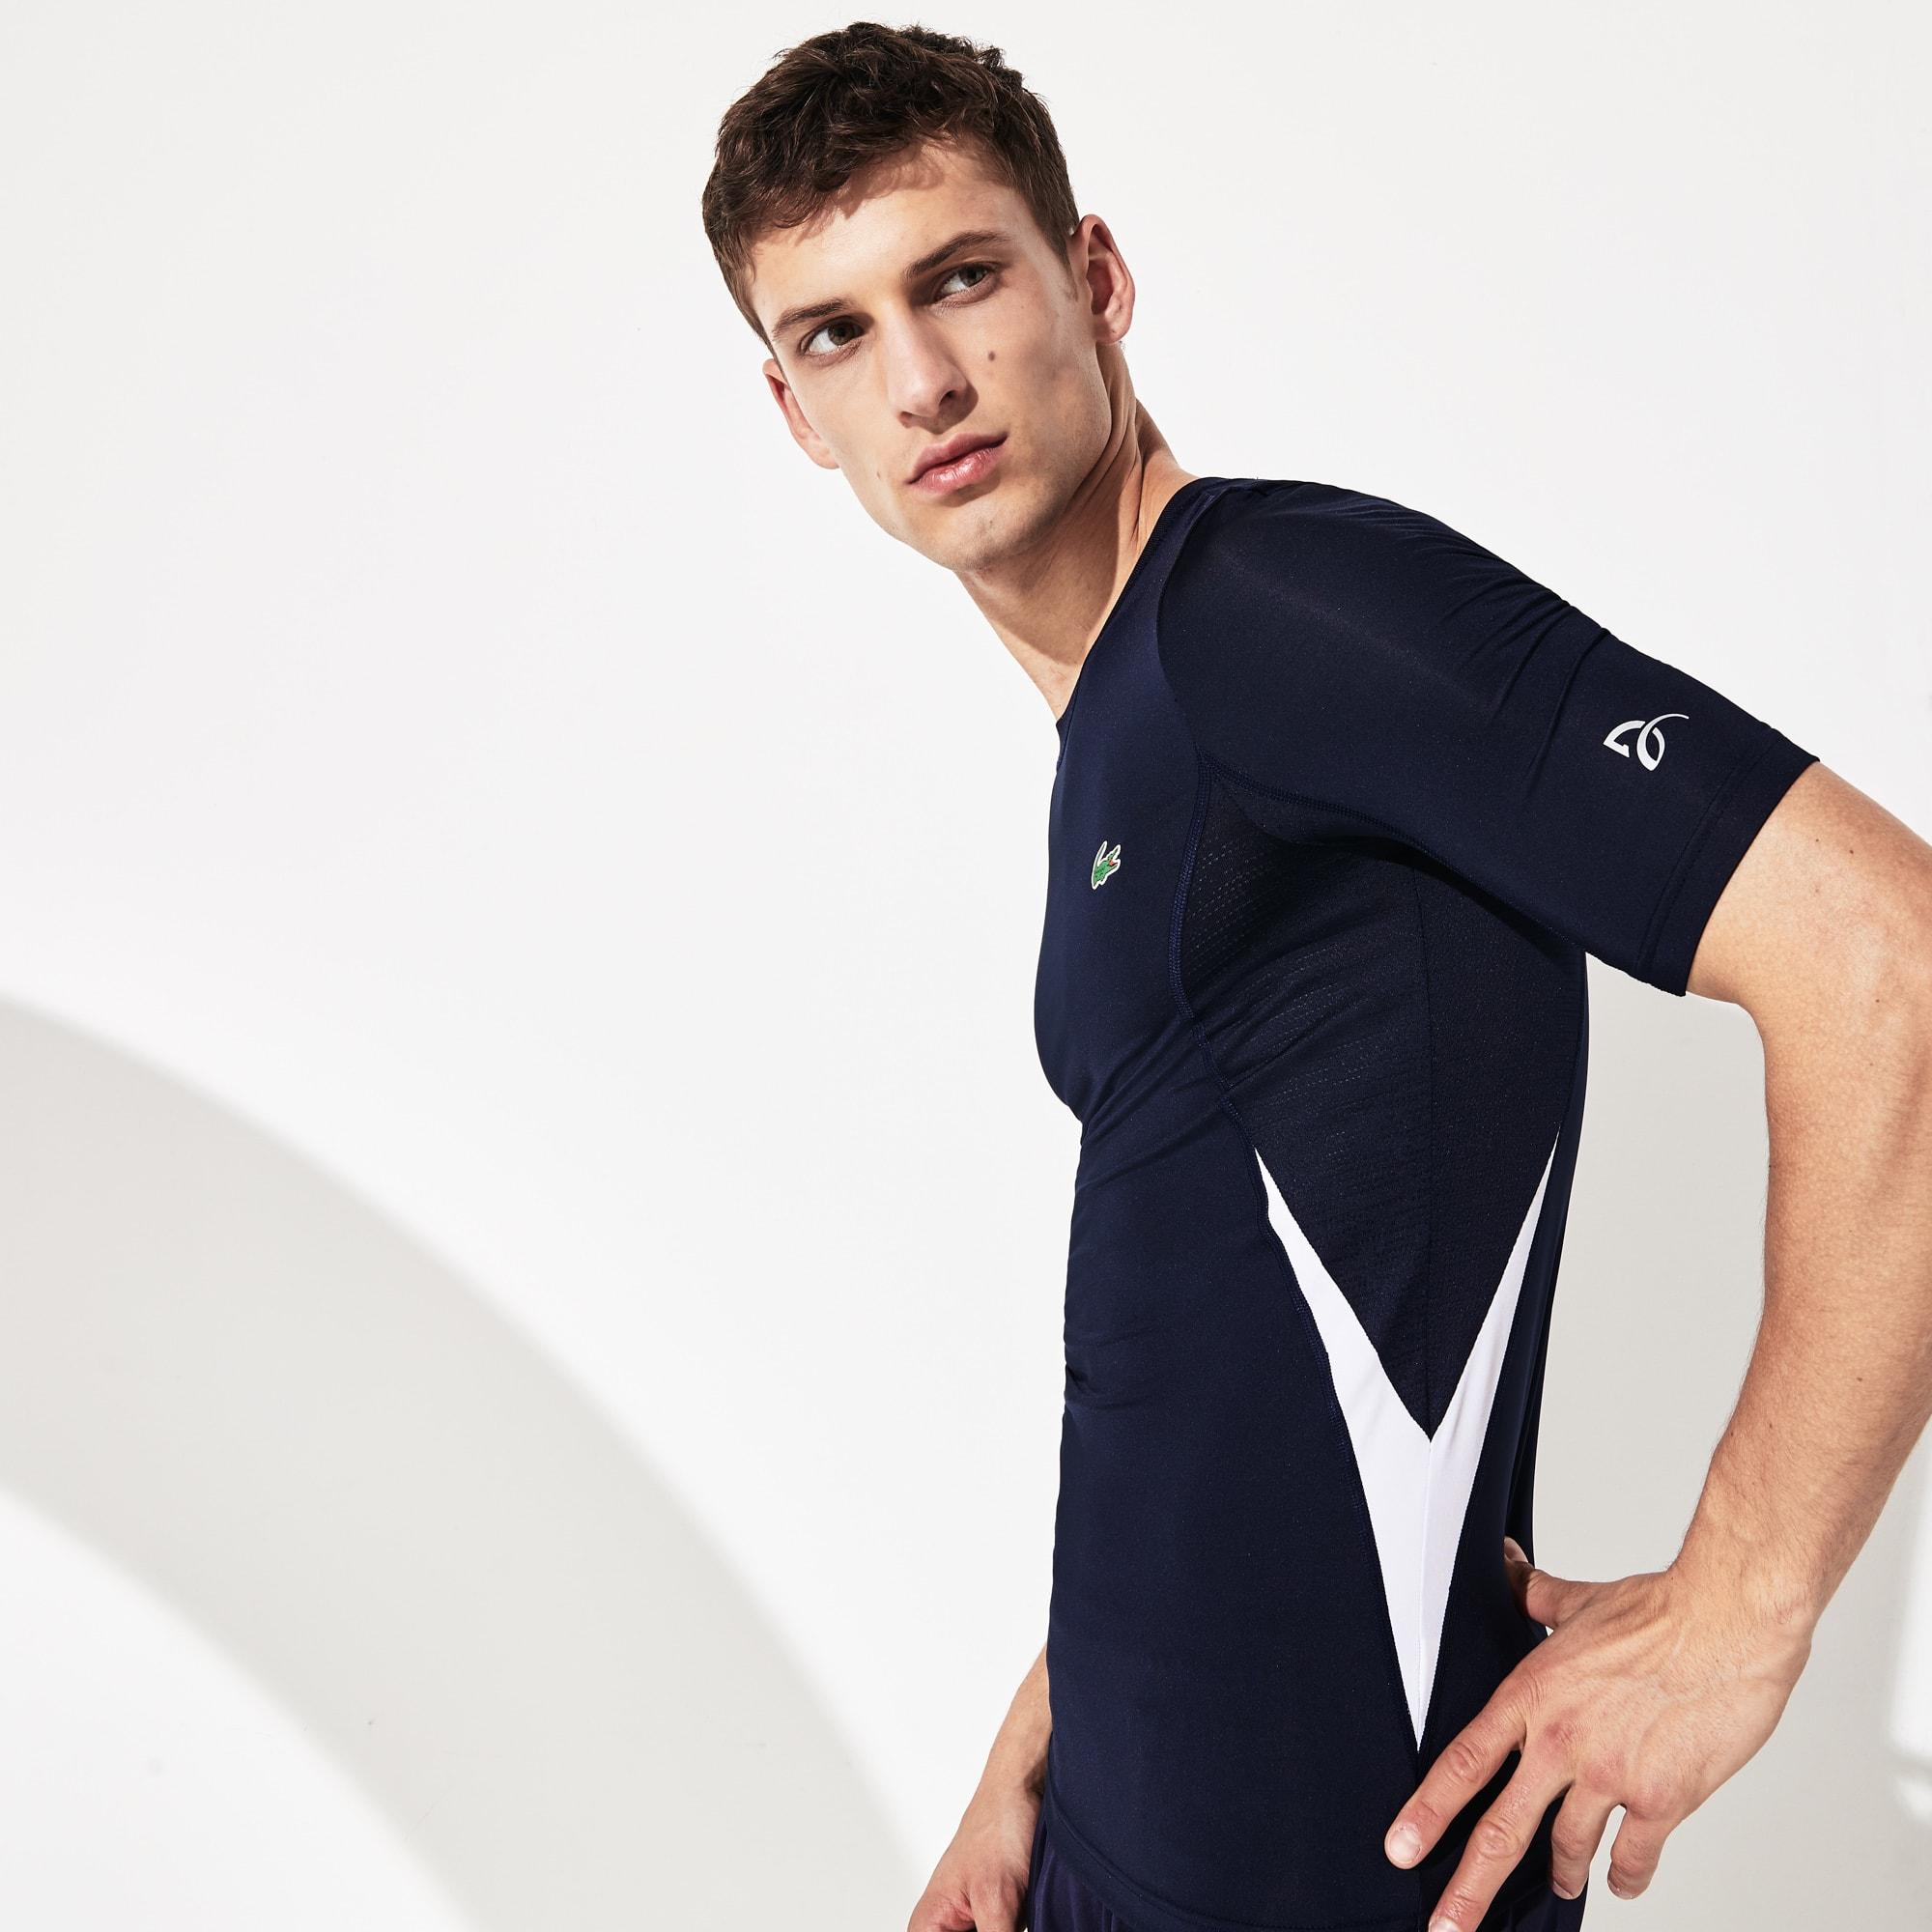 Men's SPORT Novak Djokovic Ultra Dry Stretch Jersey T-shirt